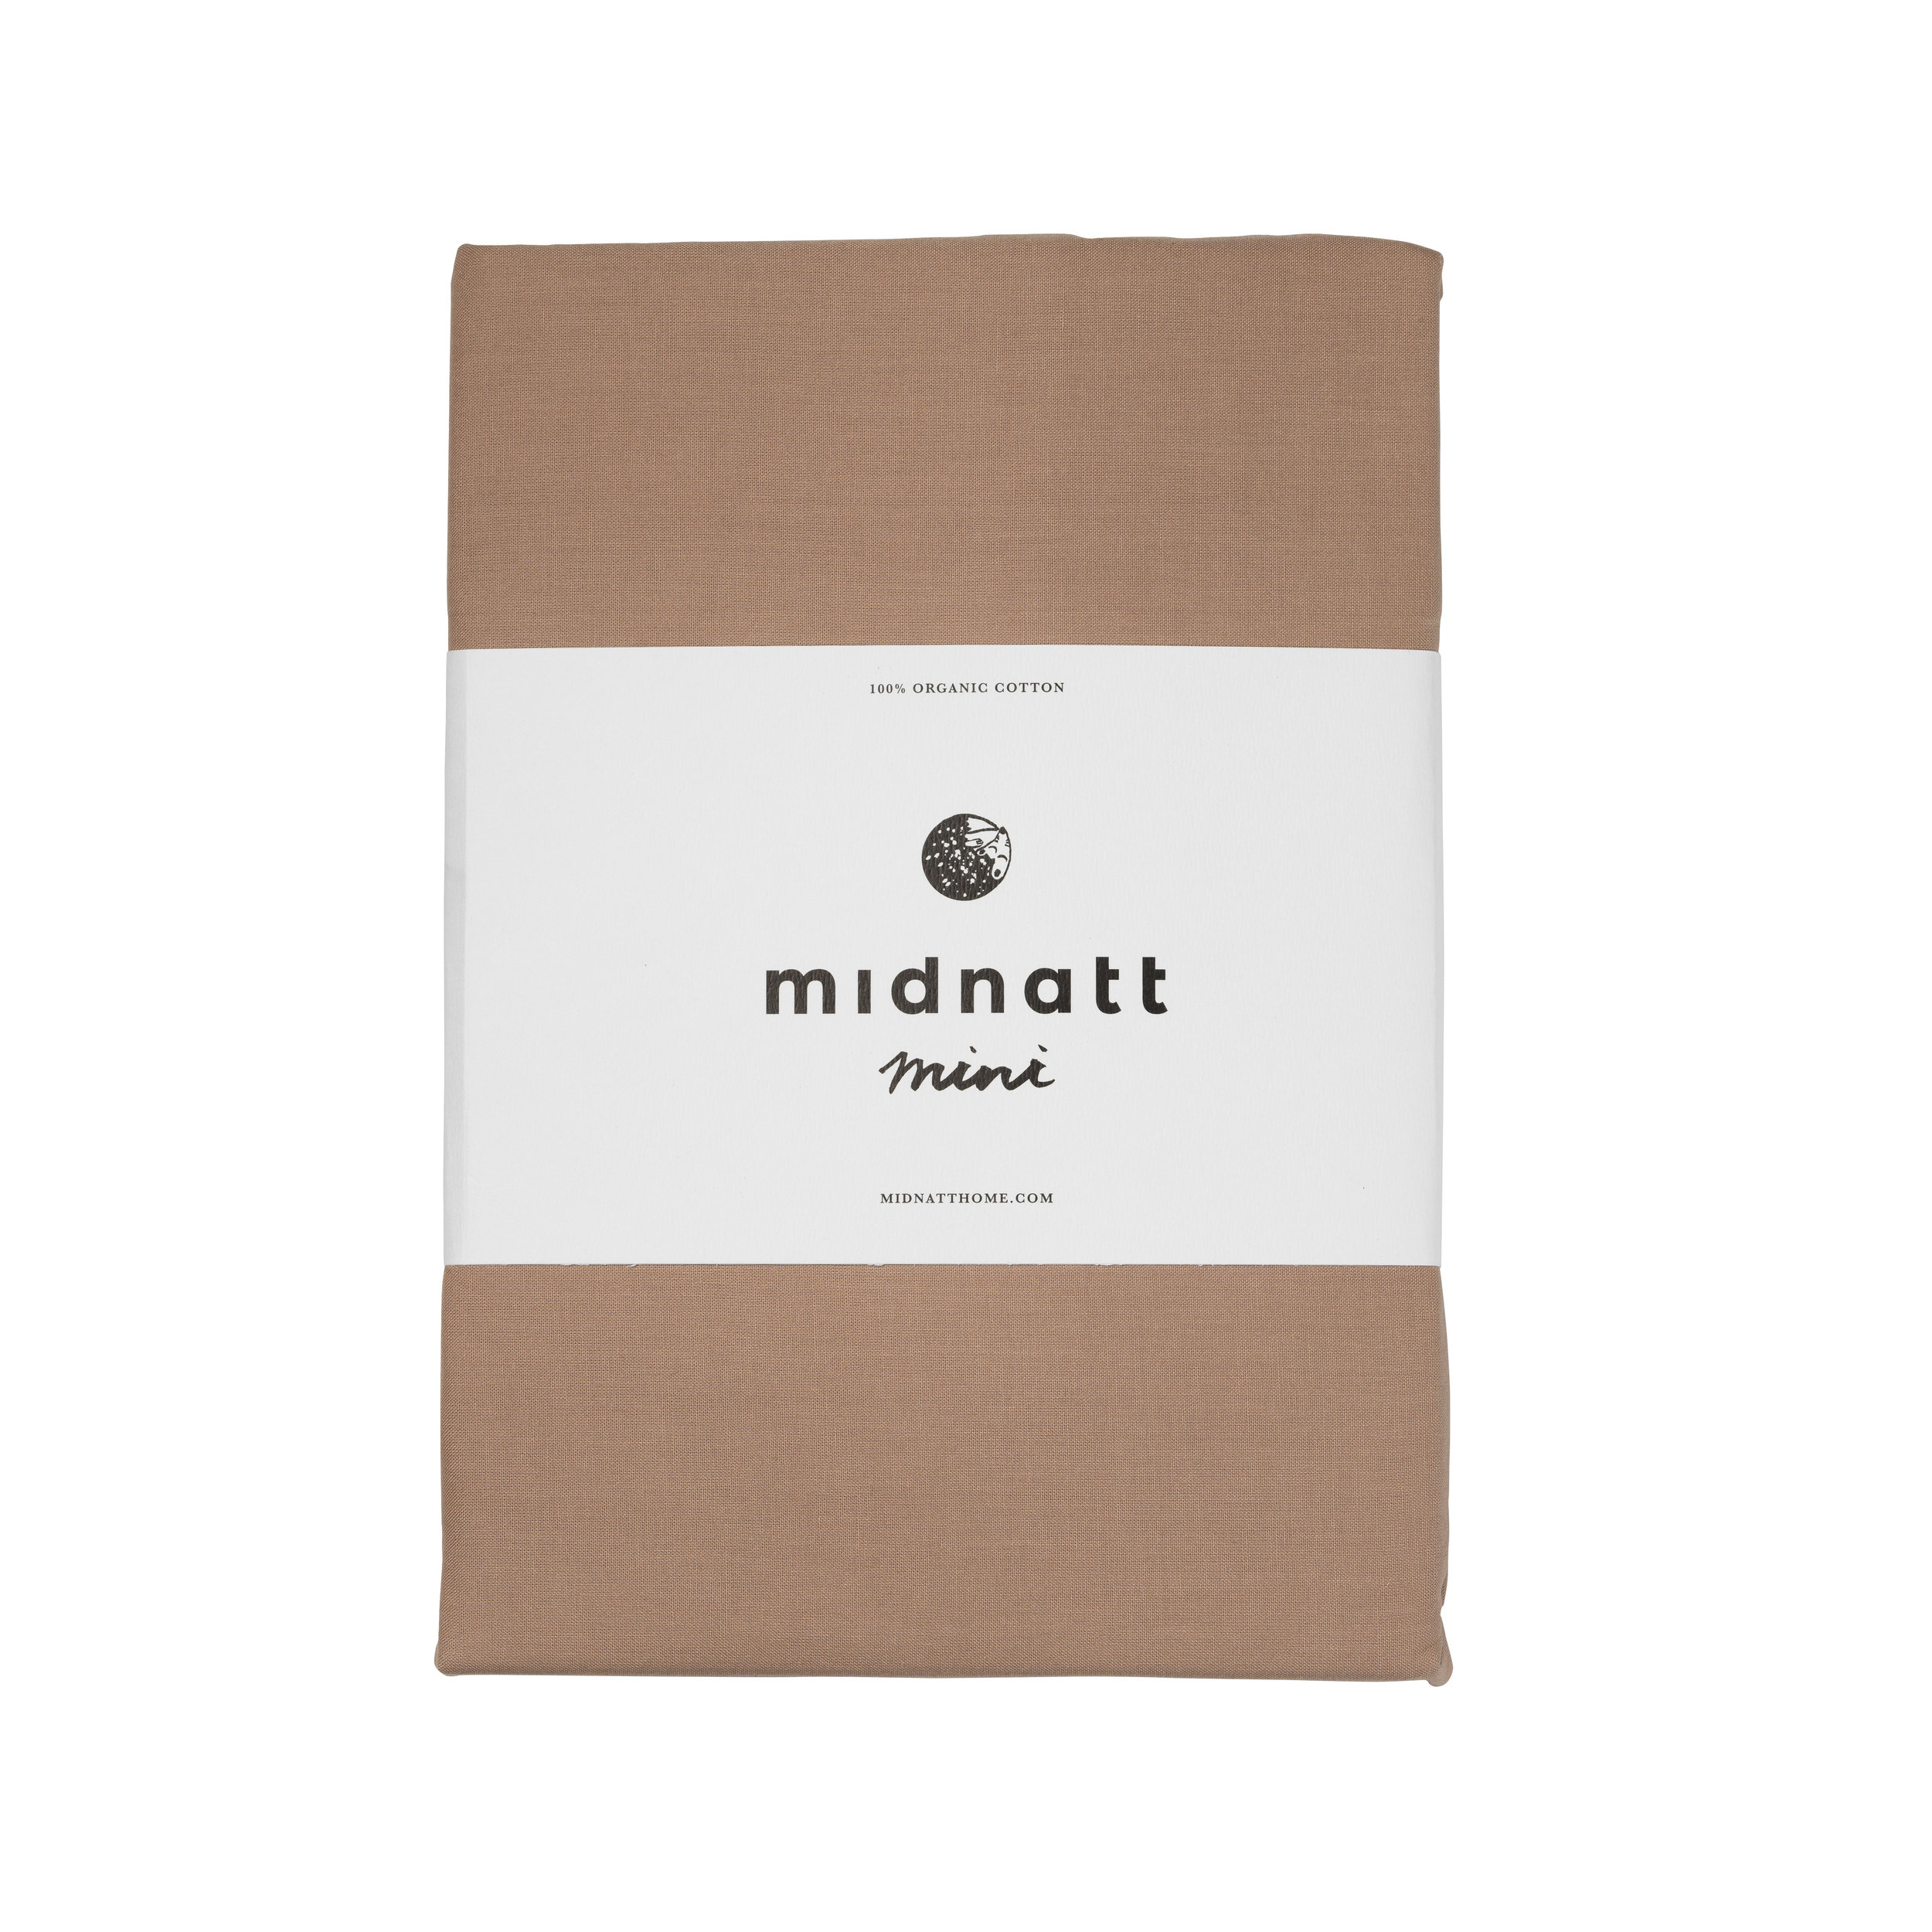 forpackning-paslakan-spjalsang-rosa-wilted-midnatt.jpg